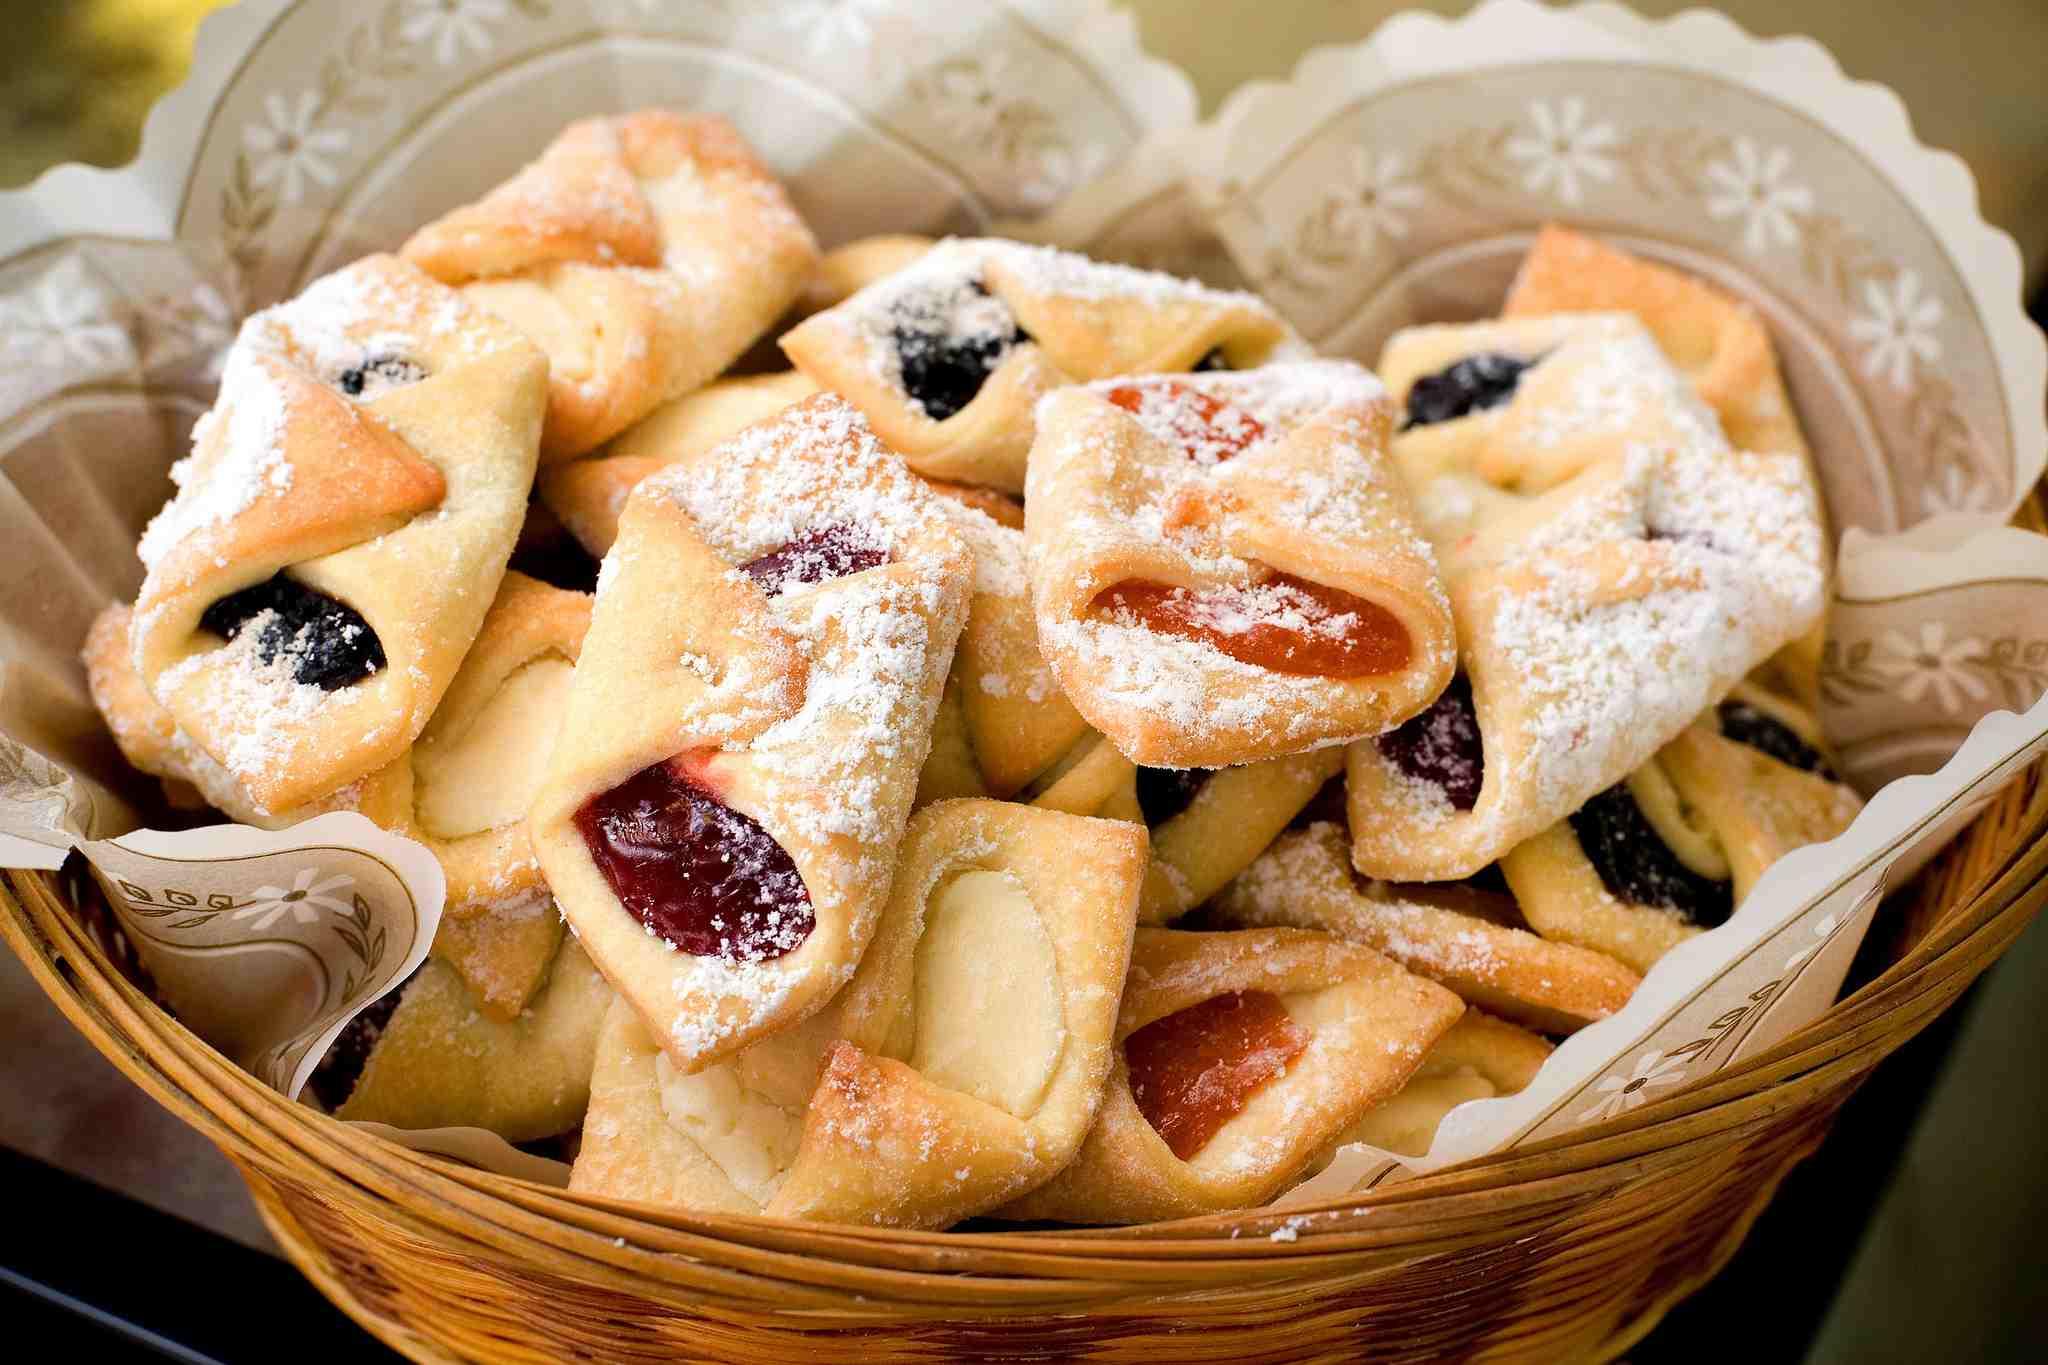 kolaczki - Kolacky Polish Christmas Cookies